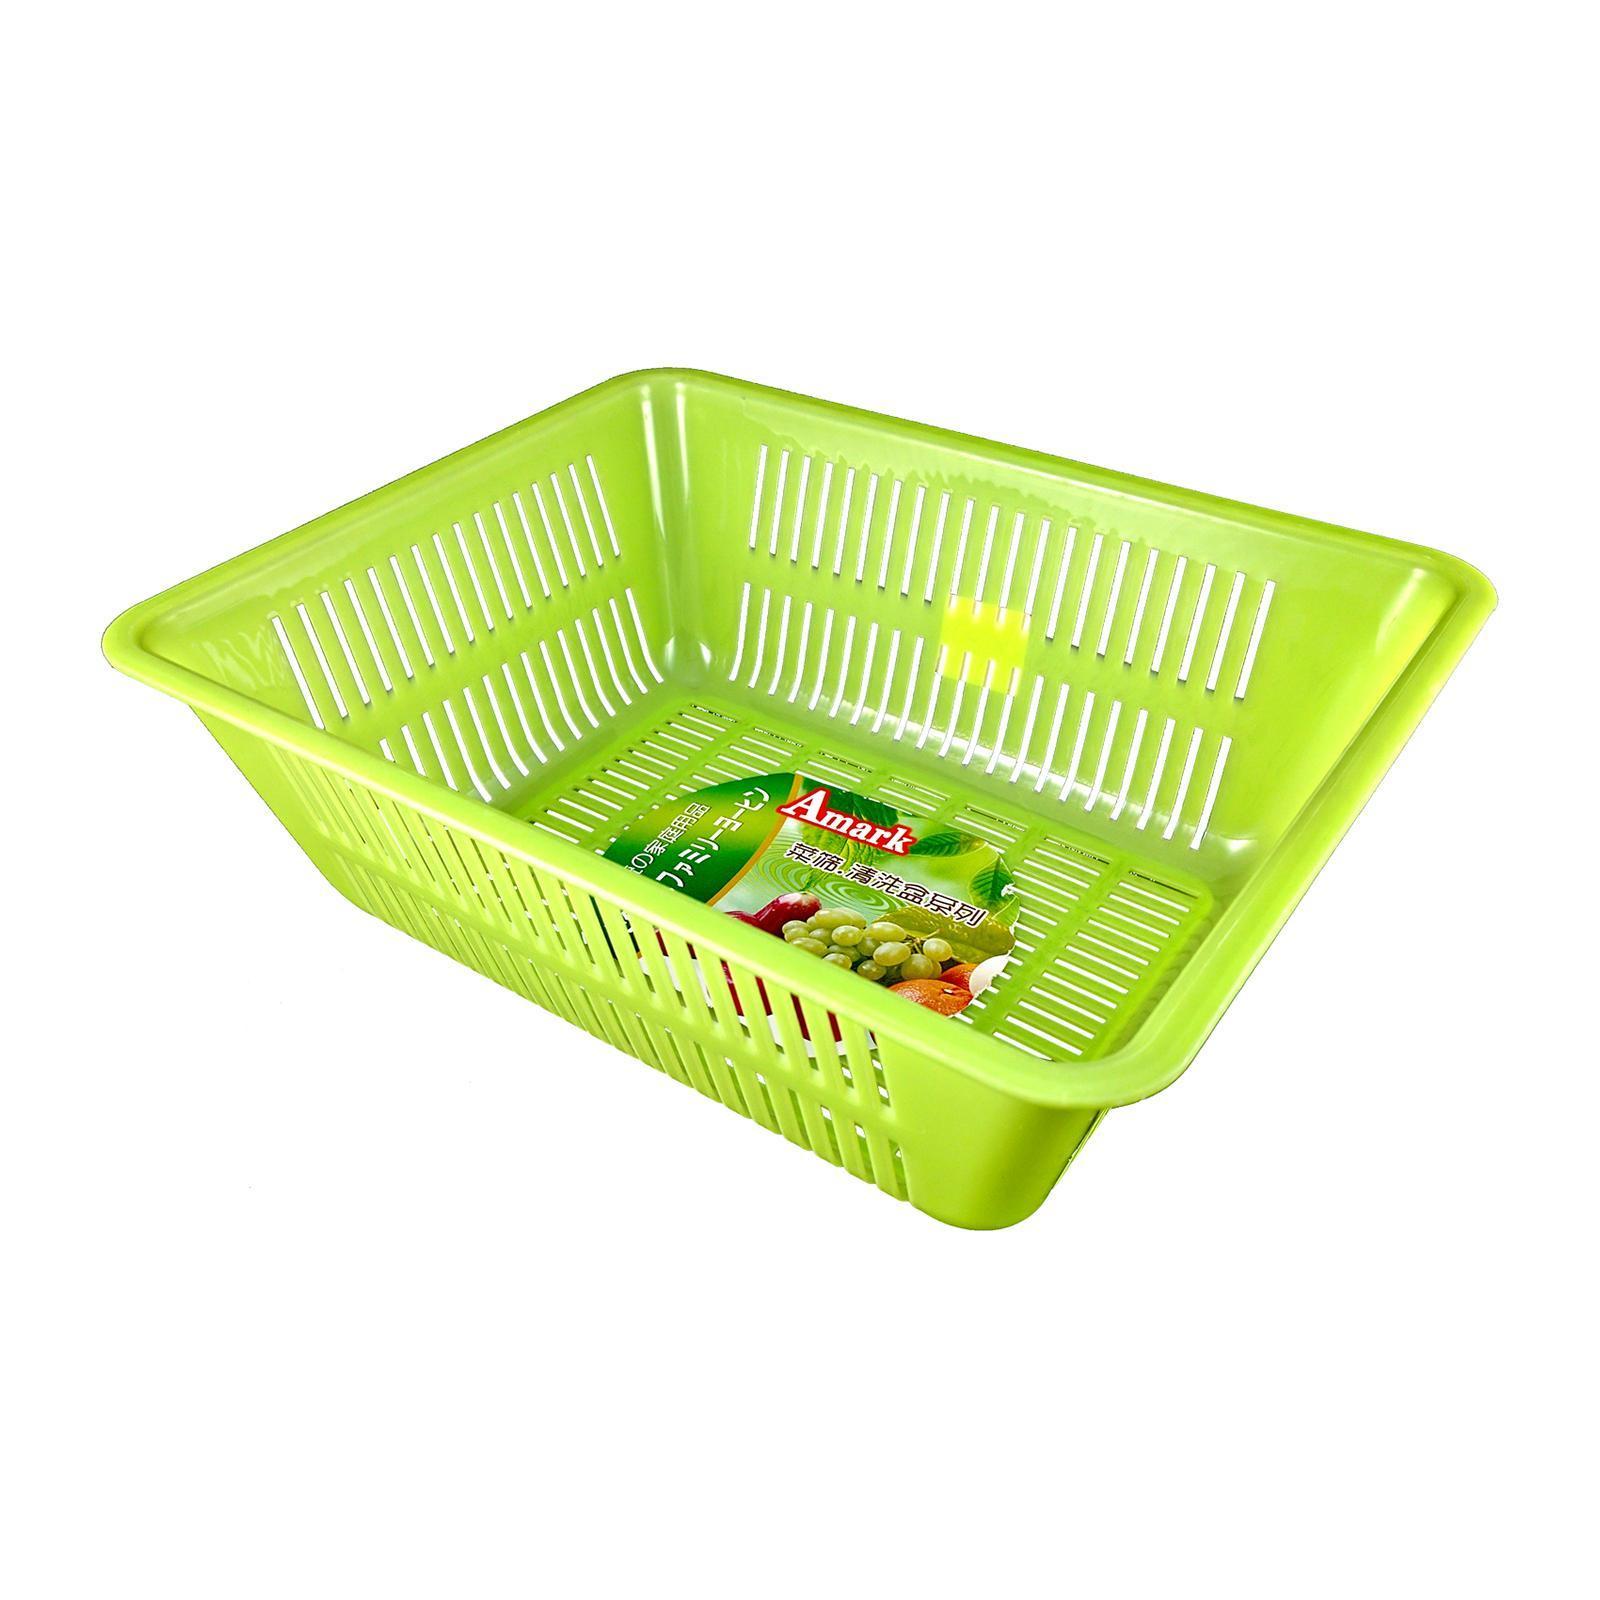 Amark Rectangular Plastic Basket 27x22x10 Cm (Green)